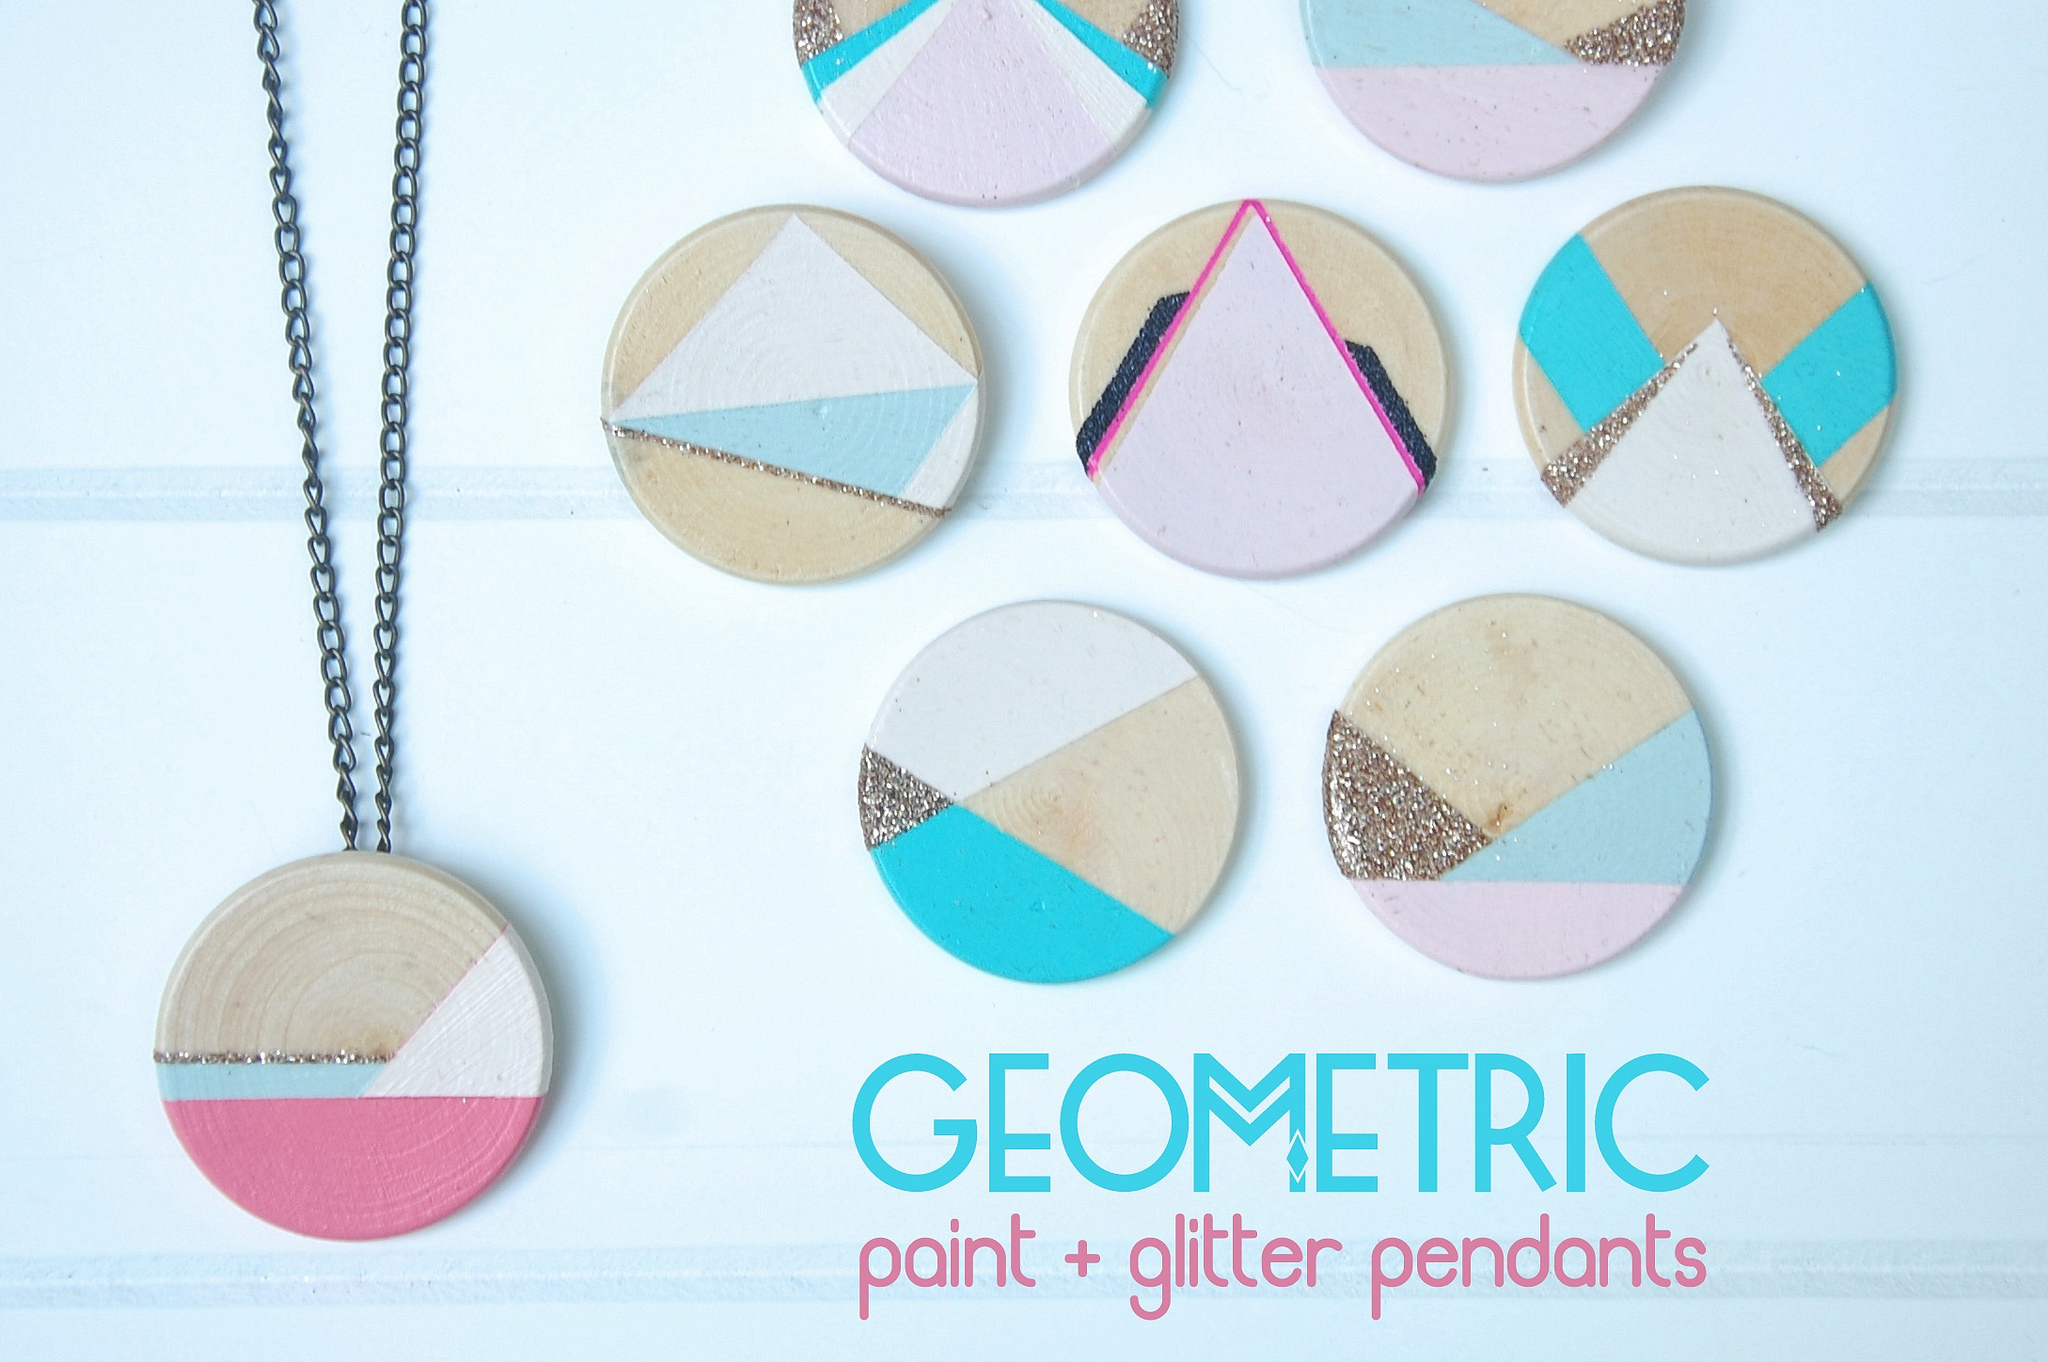 Geometric Glitter Pendant